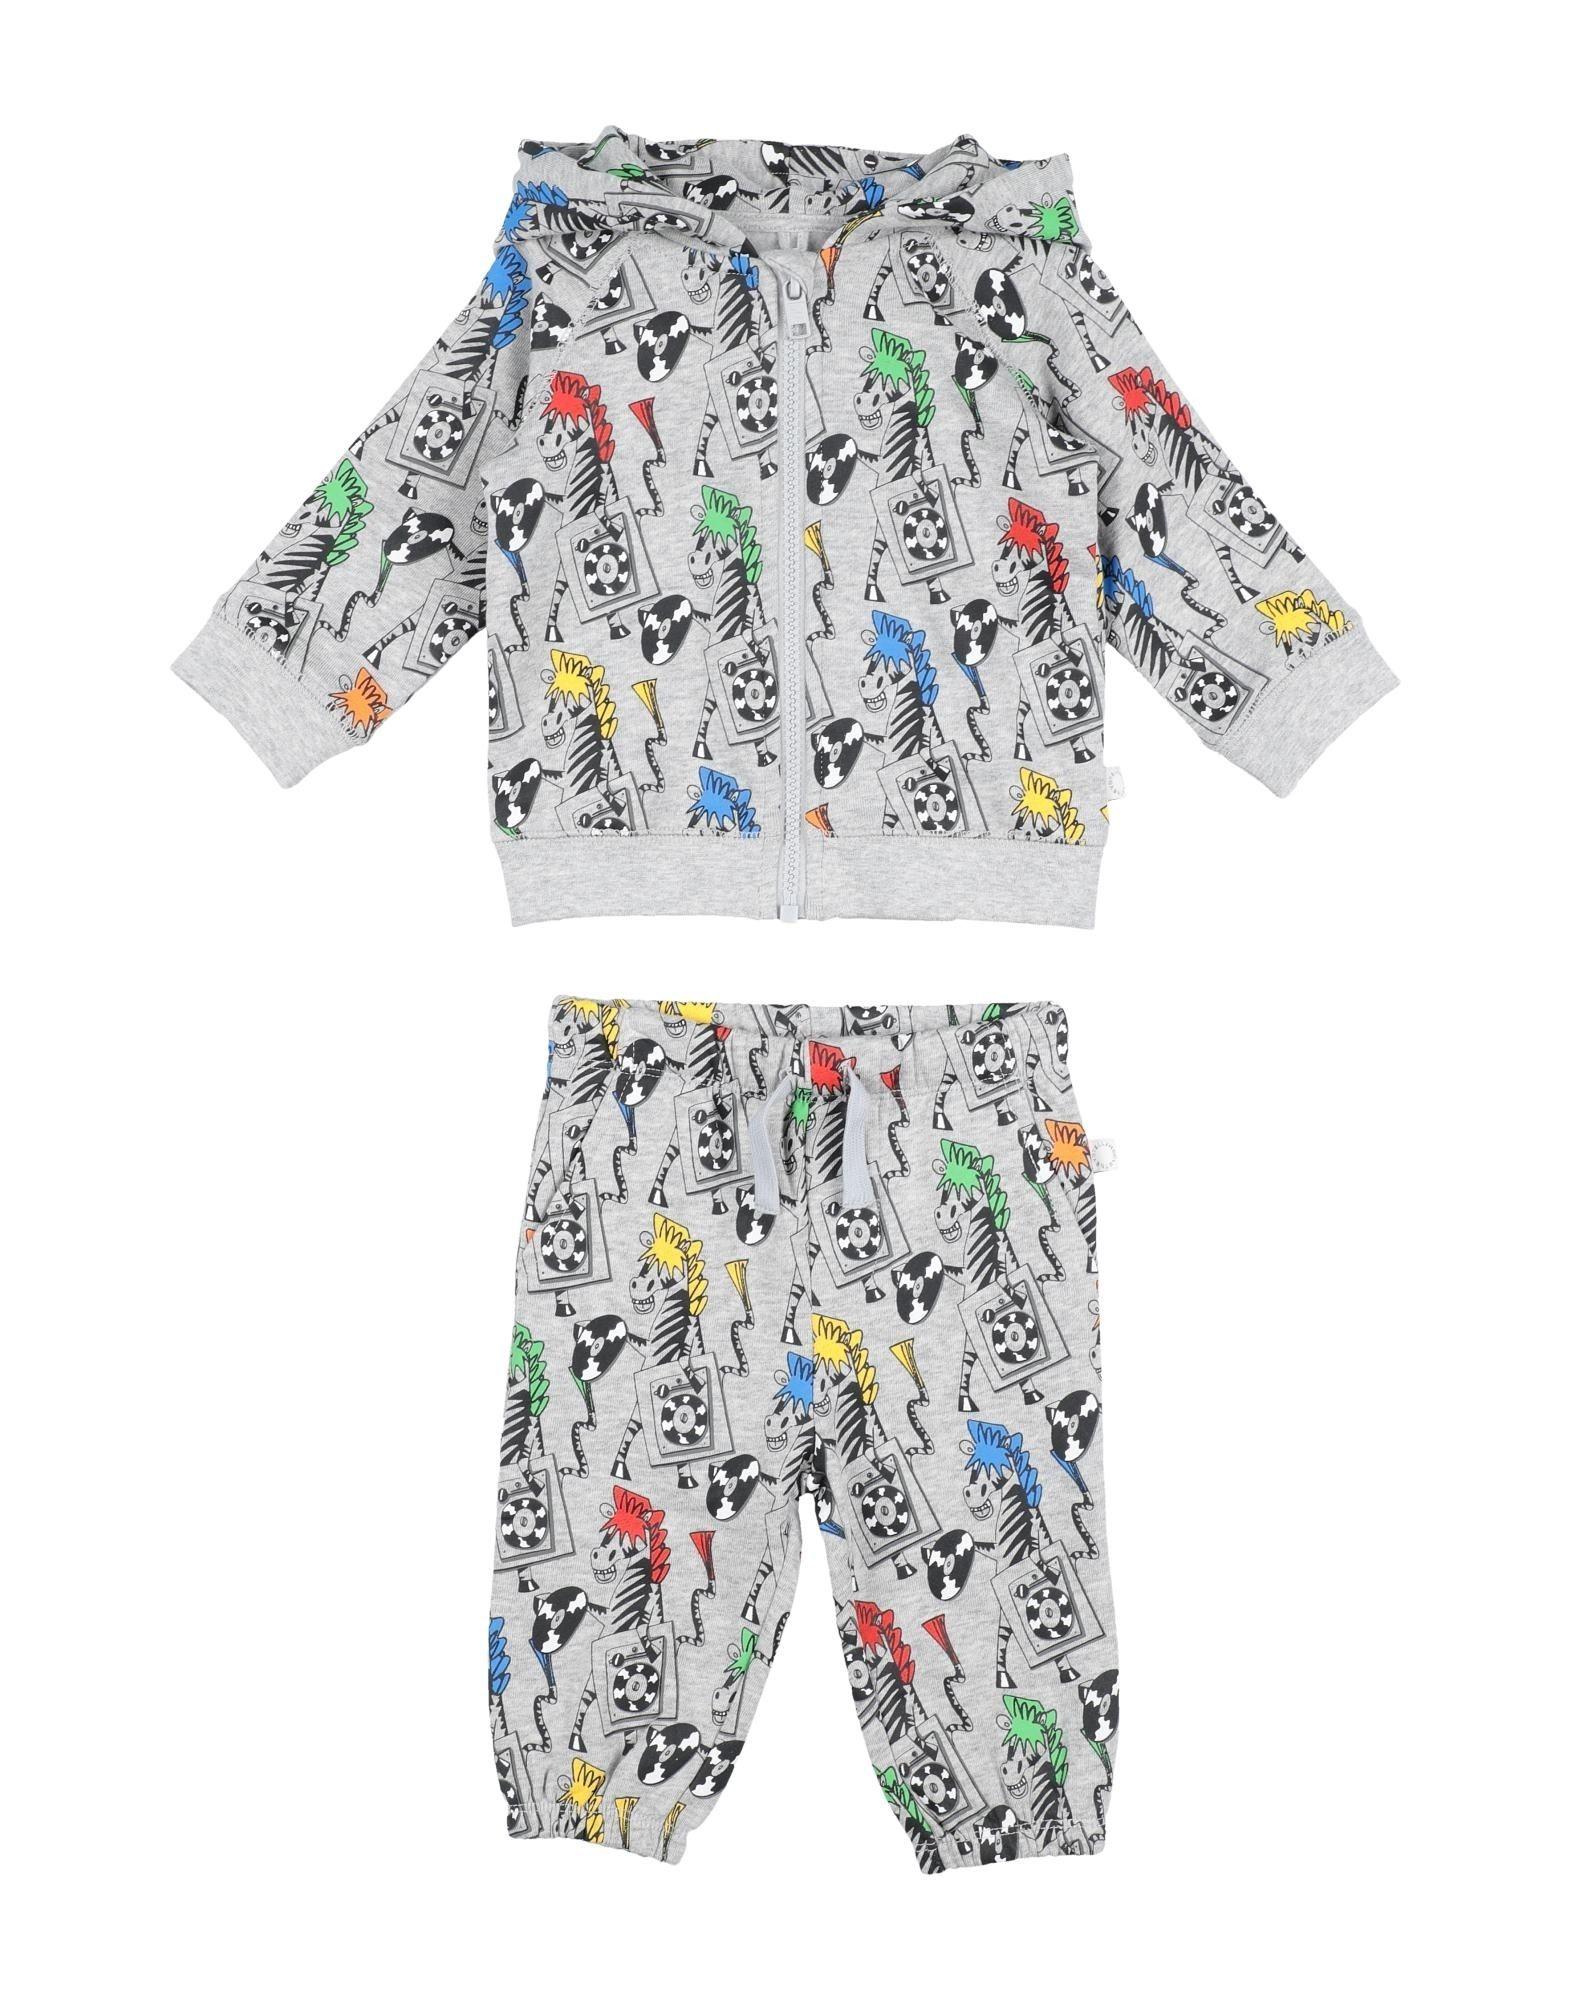 STELLA McCARTNEY KIDS Baby sweatsuits. sweatshirt fleece, logo, cartoon print, hooded collar, long sleeves, zipper closure, front closure, fleece lining, 2-piece set, wash at 30degree c, do not dry clean, iron at 150degree c max, do not bleach, tumble dryable. 100% Cotton